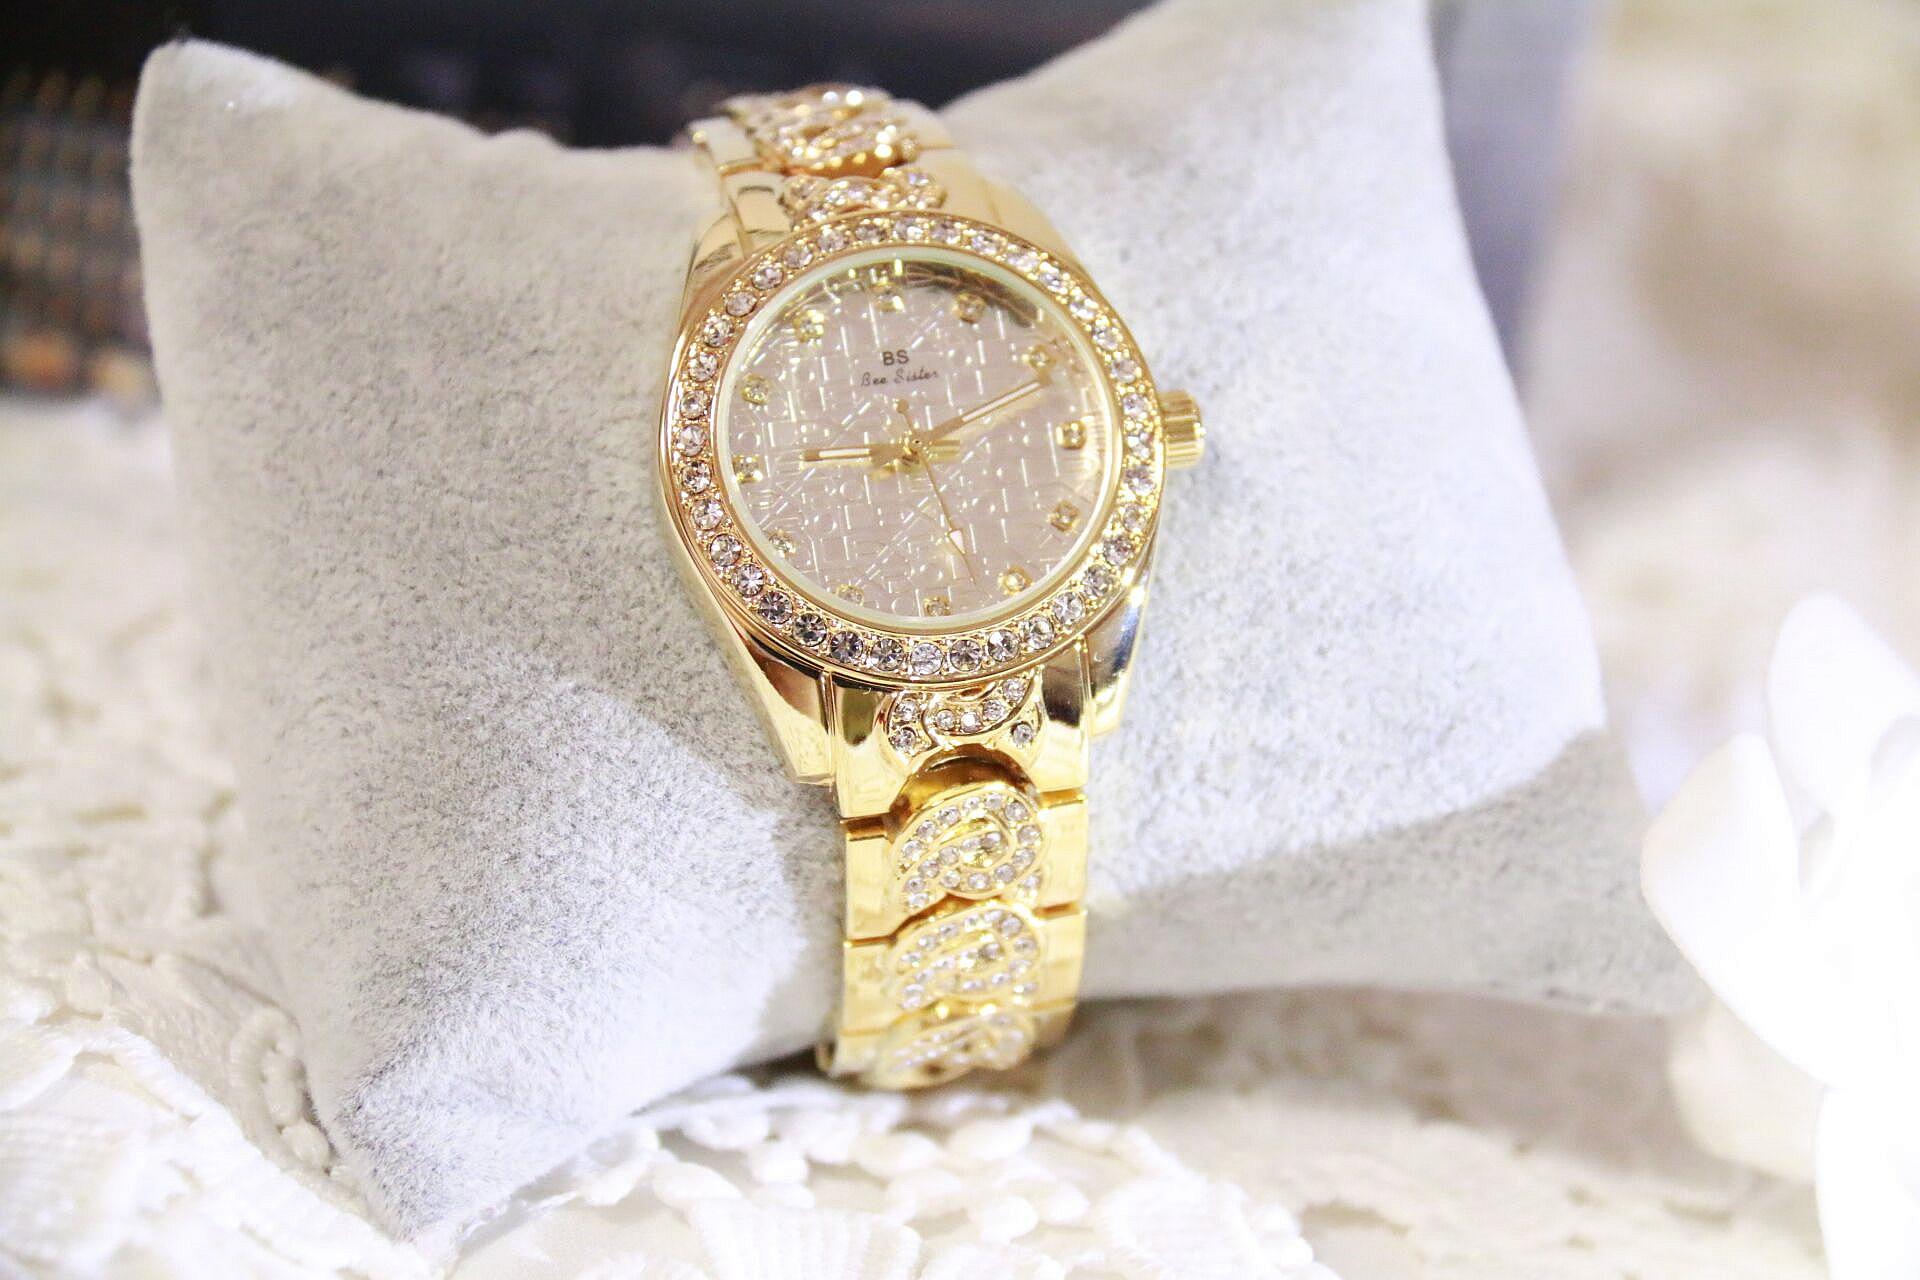 BS марка FA1277 Кристалл Алмаза Прокатки Браслет женские Часы Люксовый Бренд Модные Женские Часы Женщины Кварцевые часы Часы